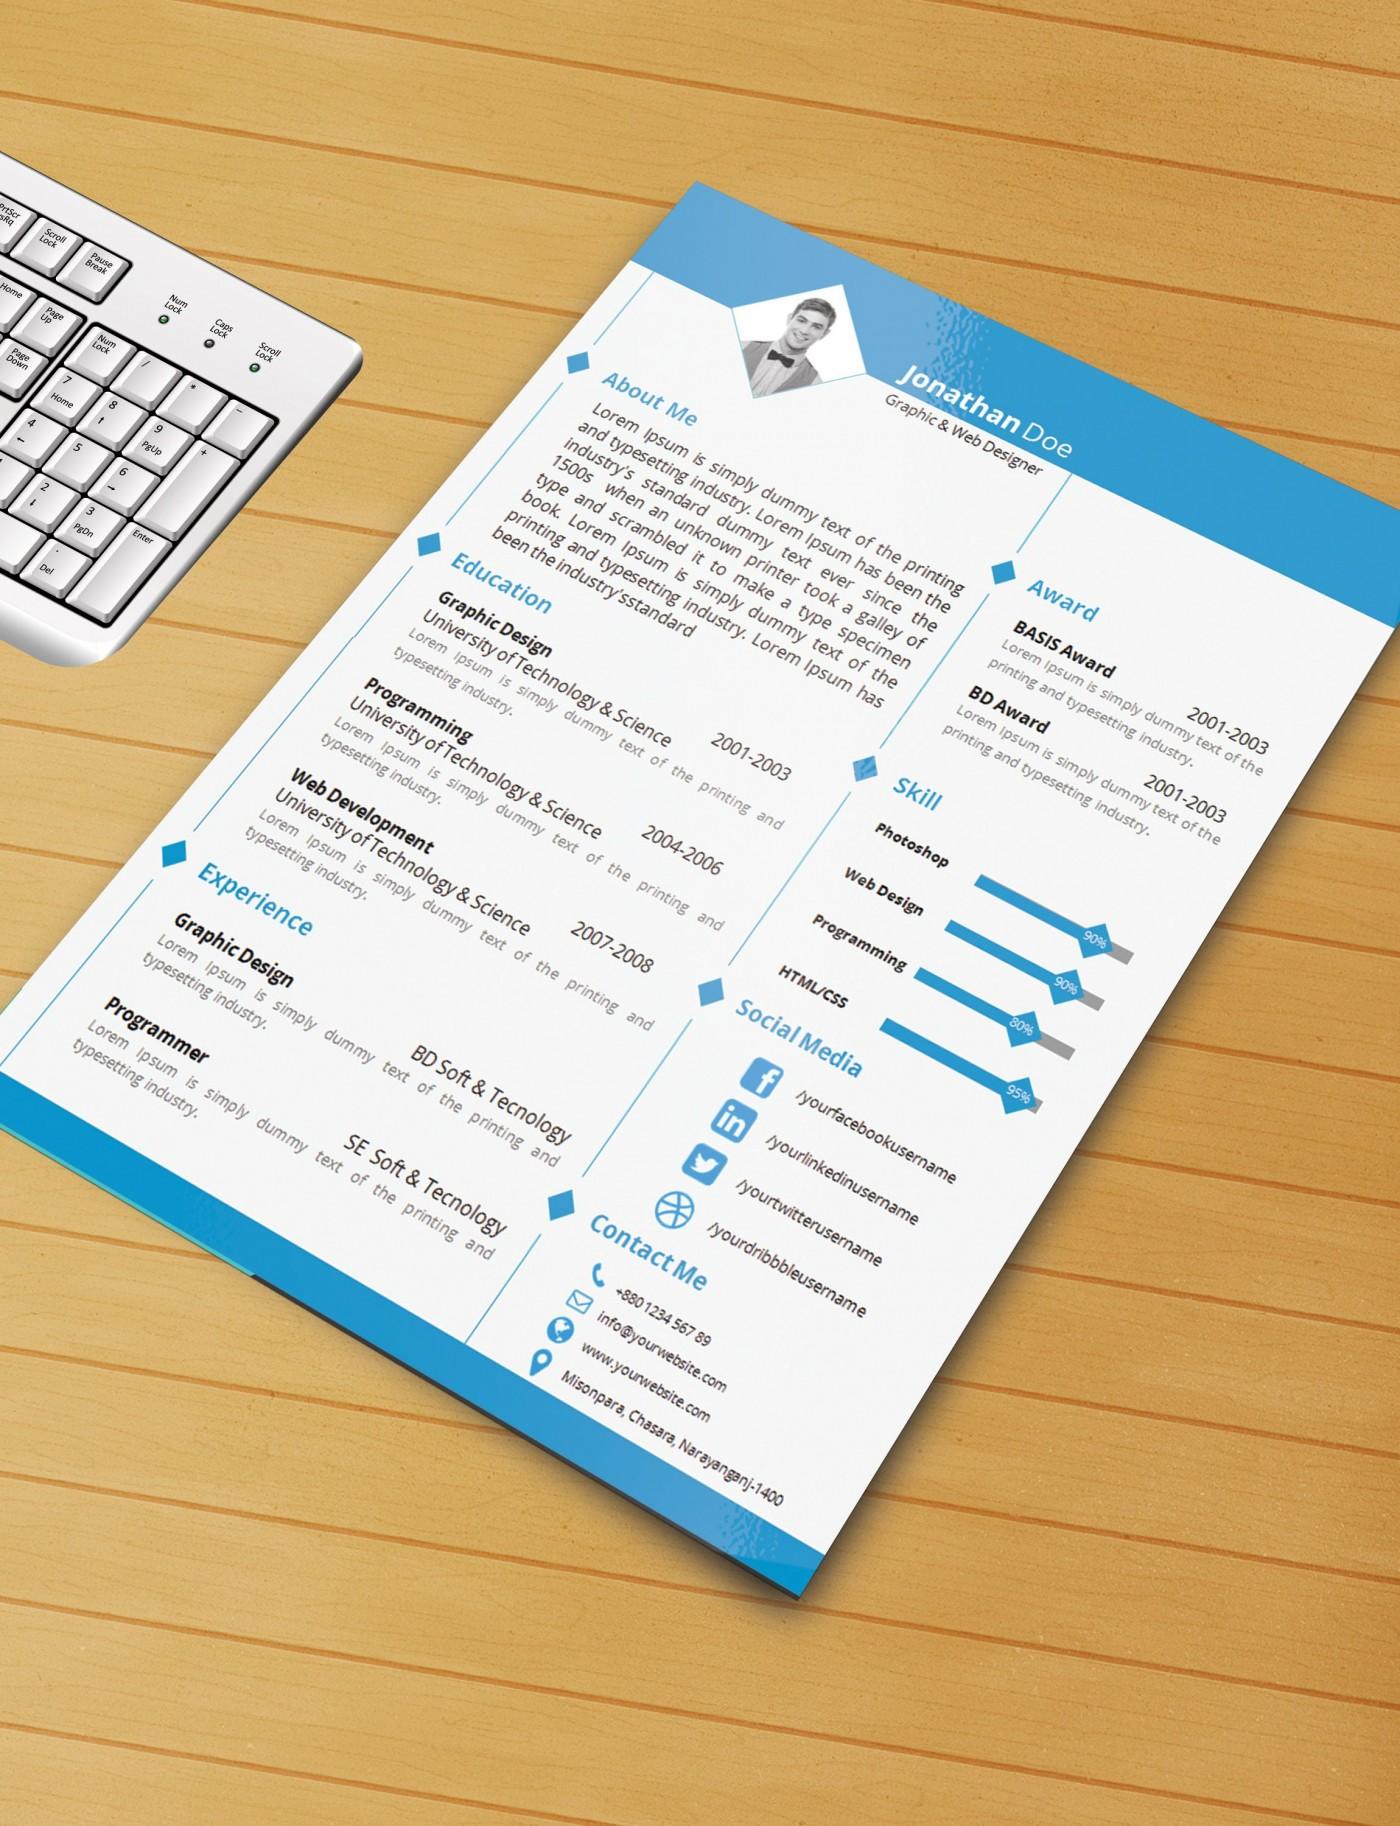 003 Imposing Microsoft Word Template Download Image  M Cv Free Header1400